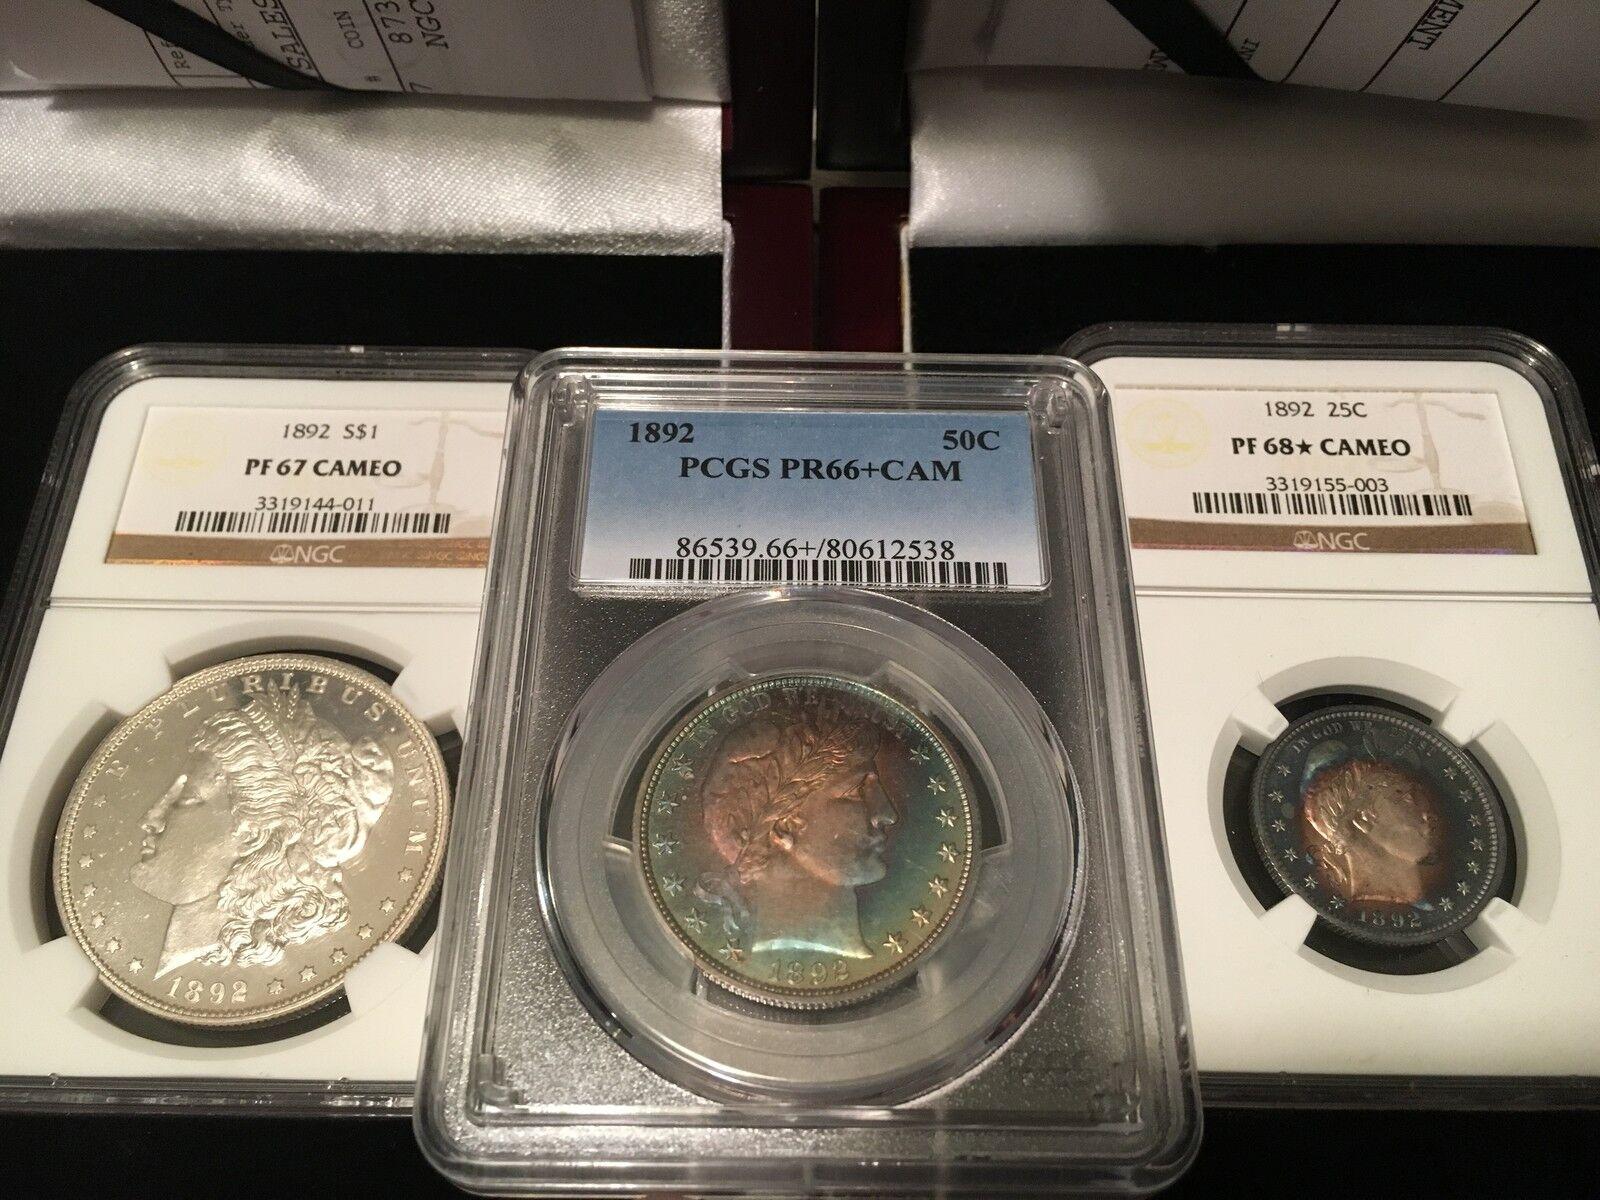 Conifer Rare Coins